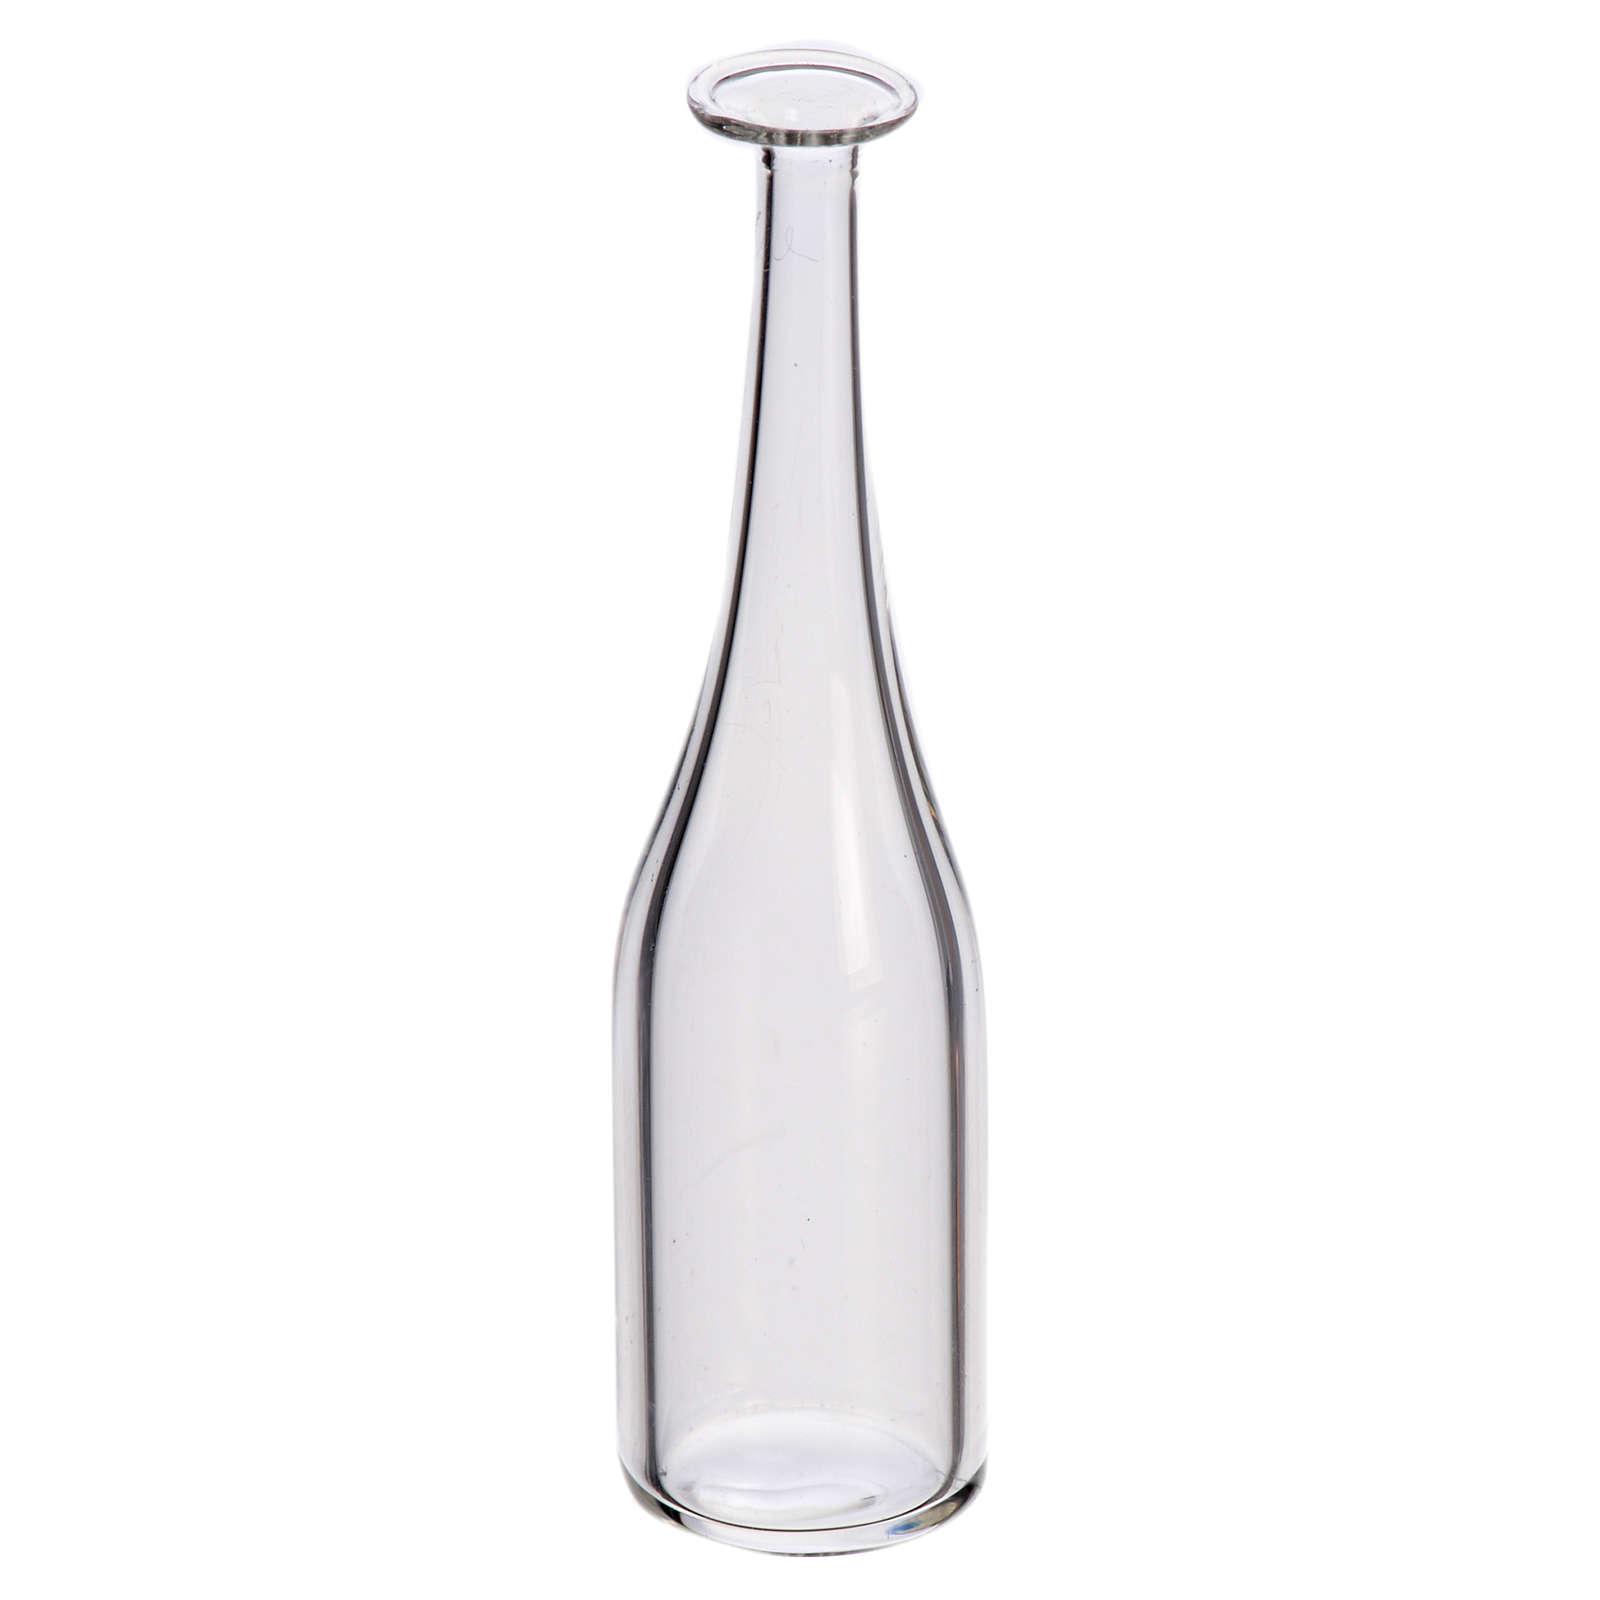 Glass wine bottle for nativity, 2.3x1cm 4